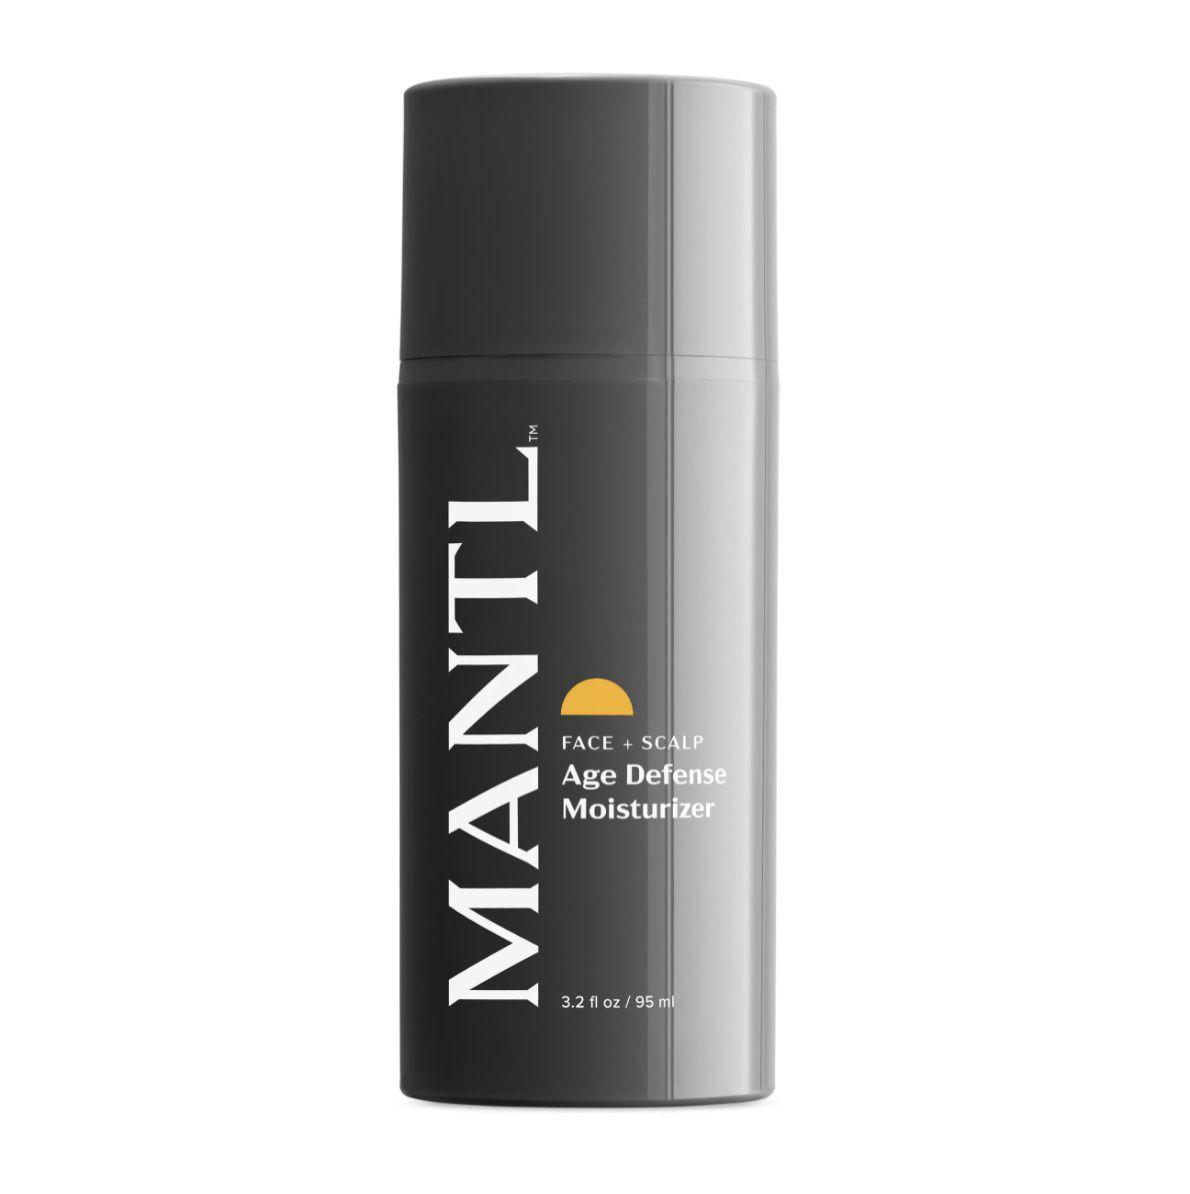 Mantl Face & Scalp Age Defense Moisturizer